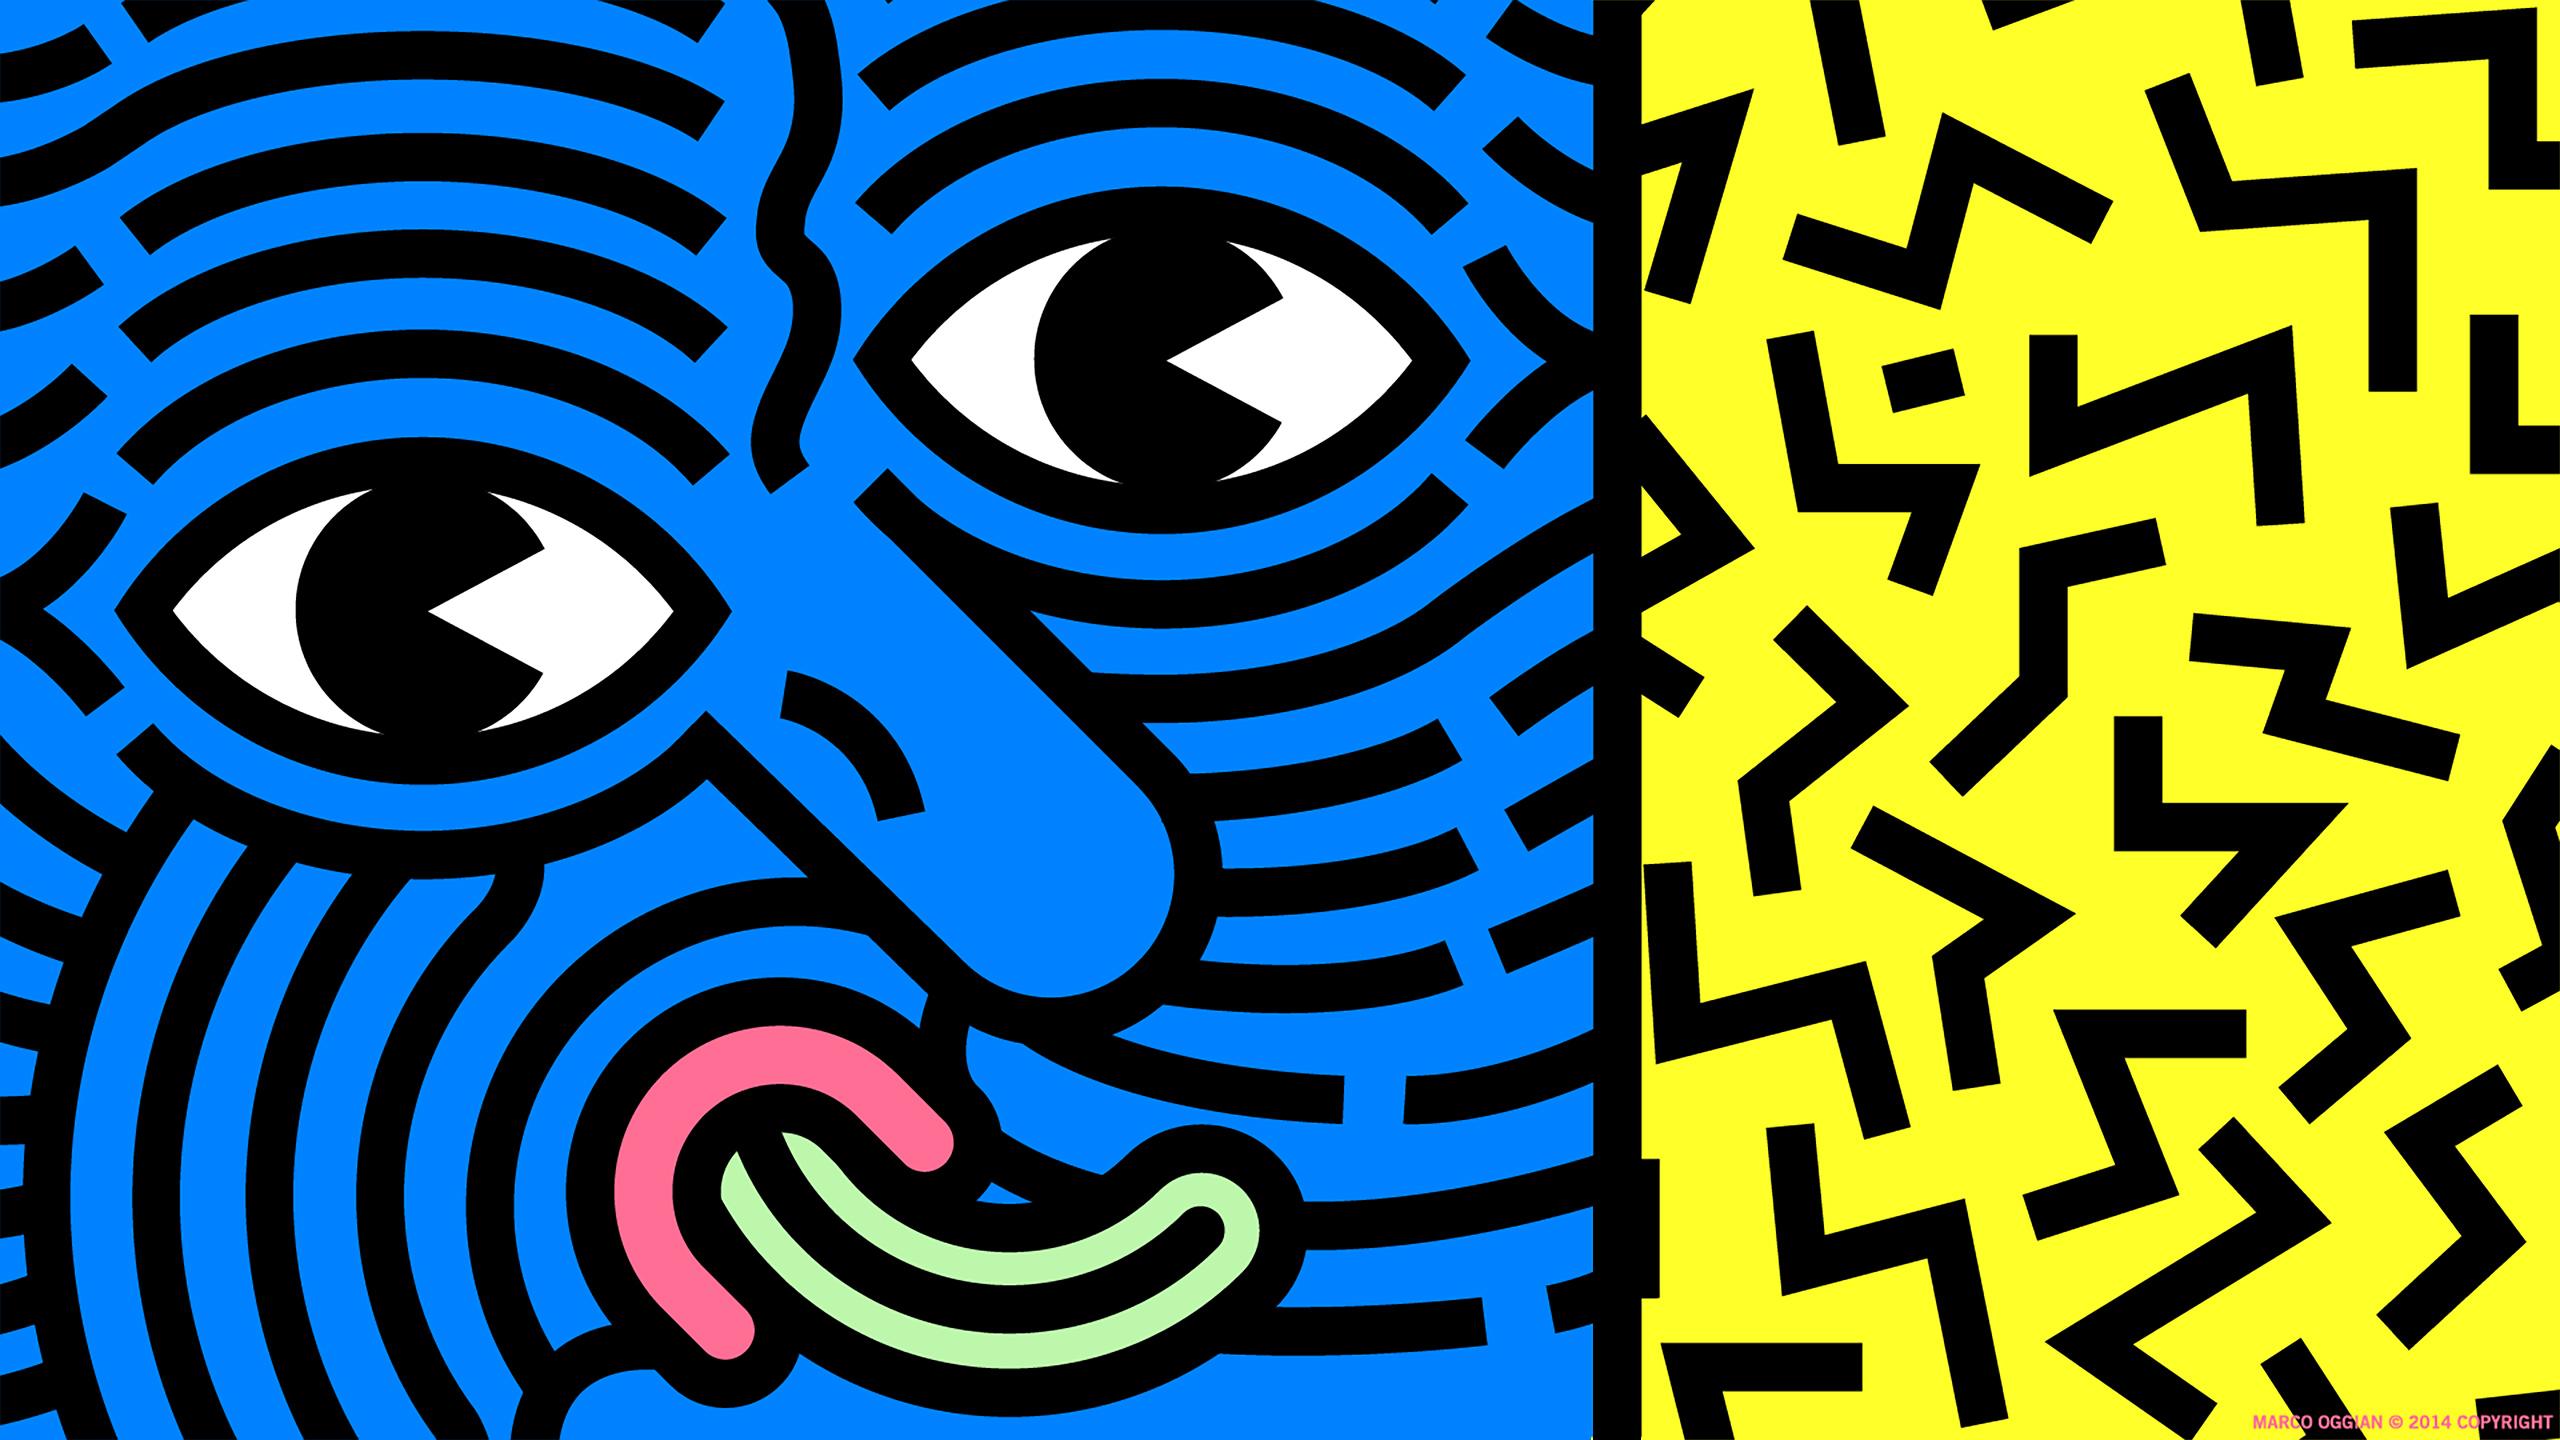 Keith Haring Iphone Wallpaper Wallpaper Of The Week Marco Oggian